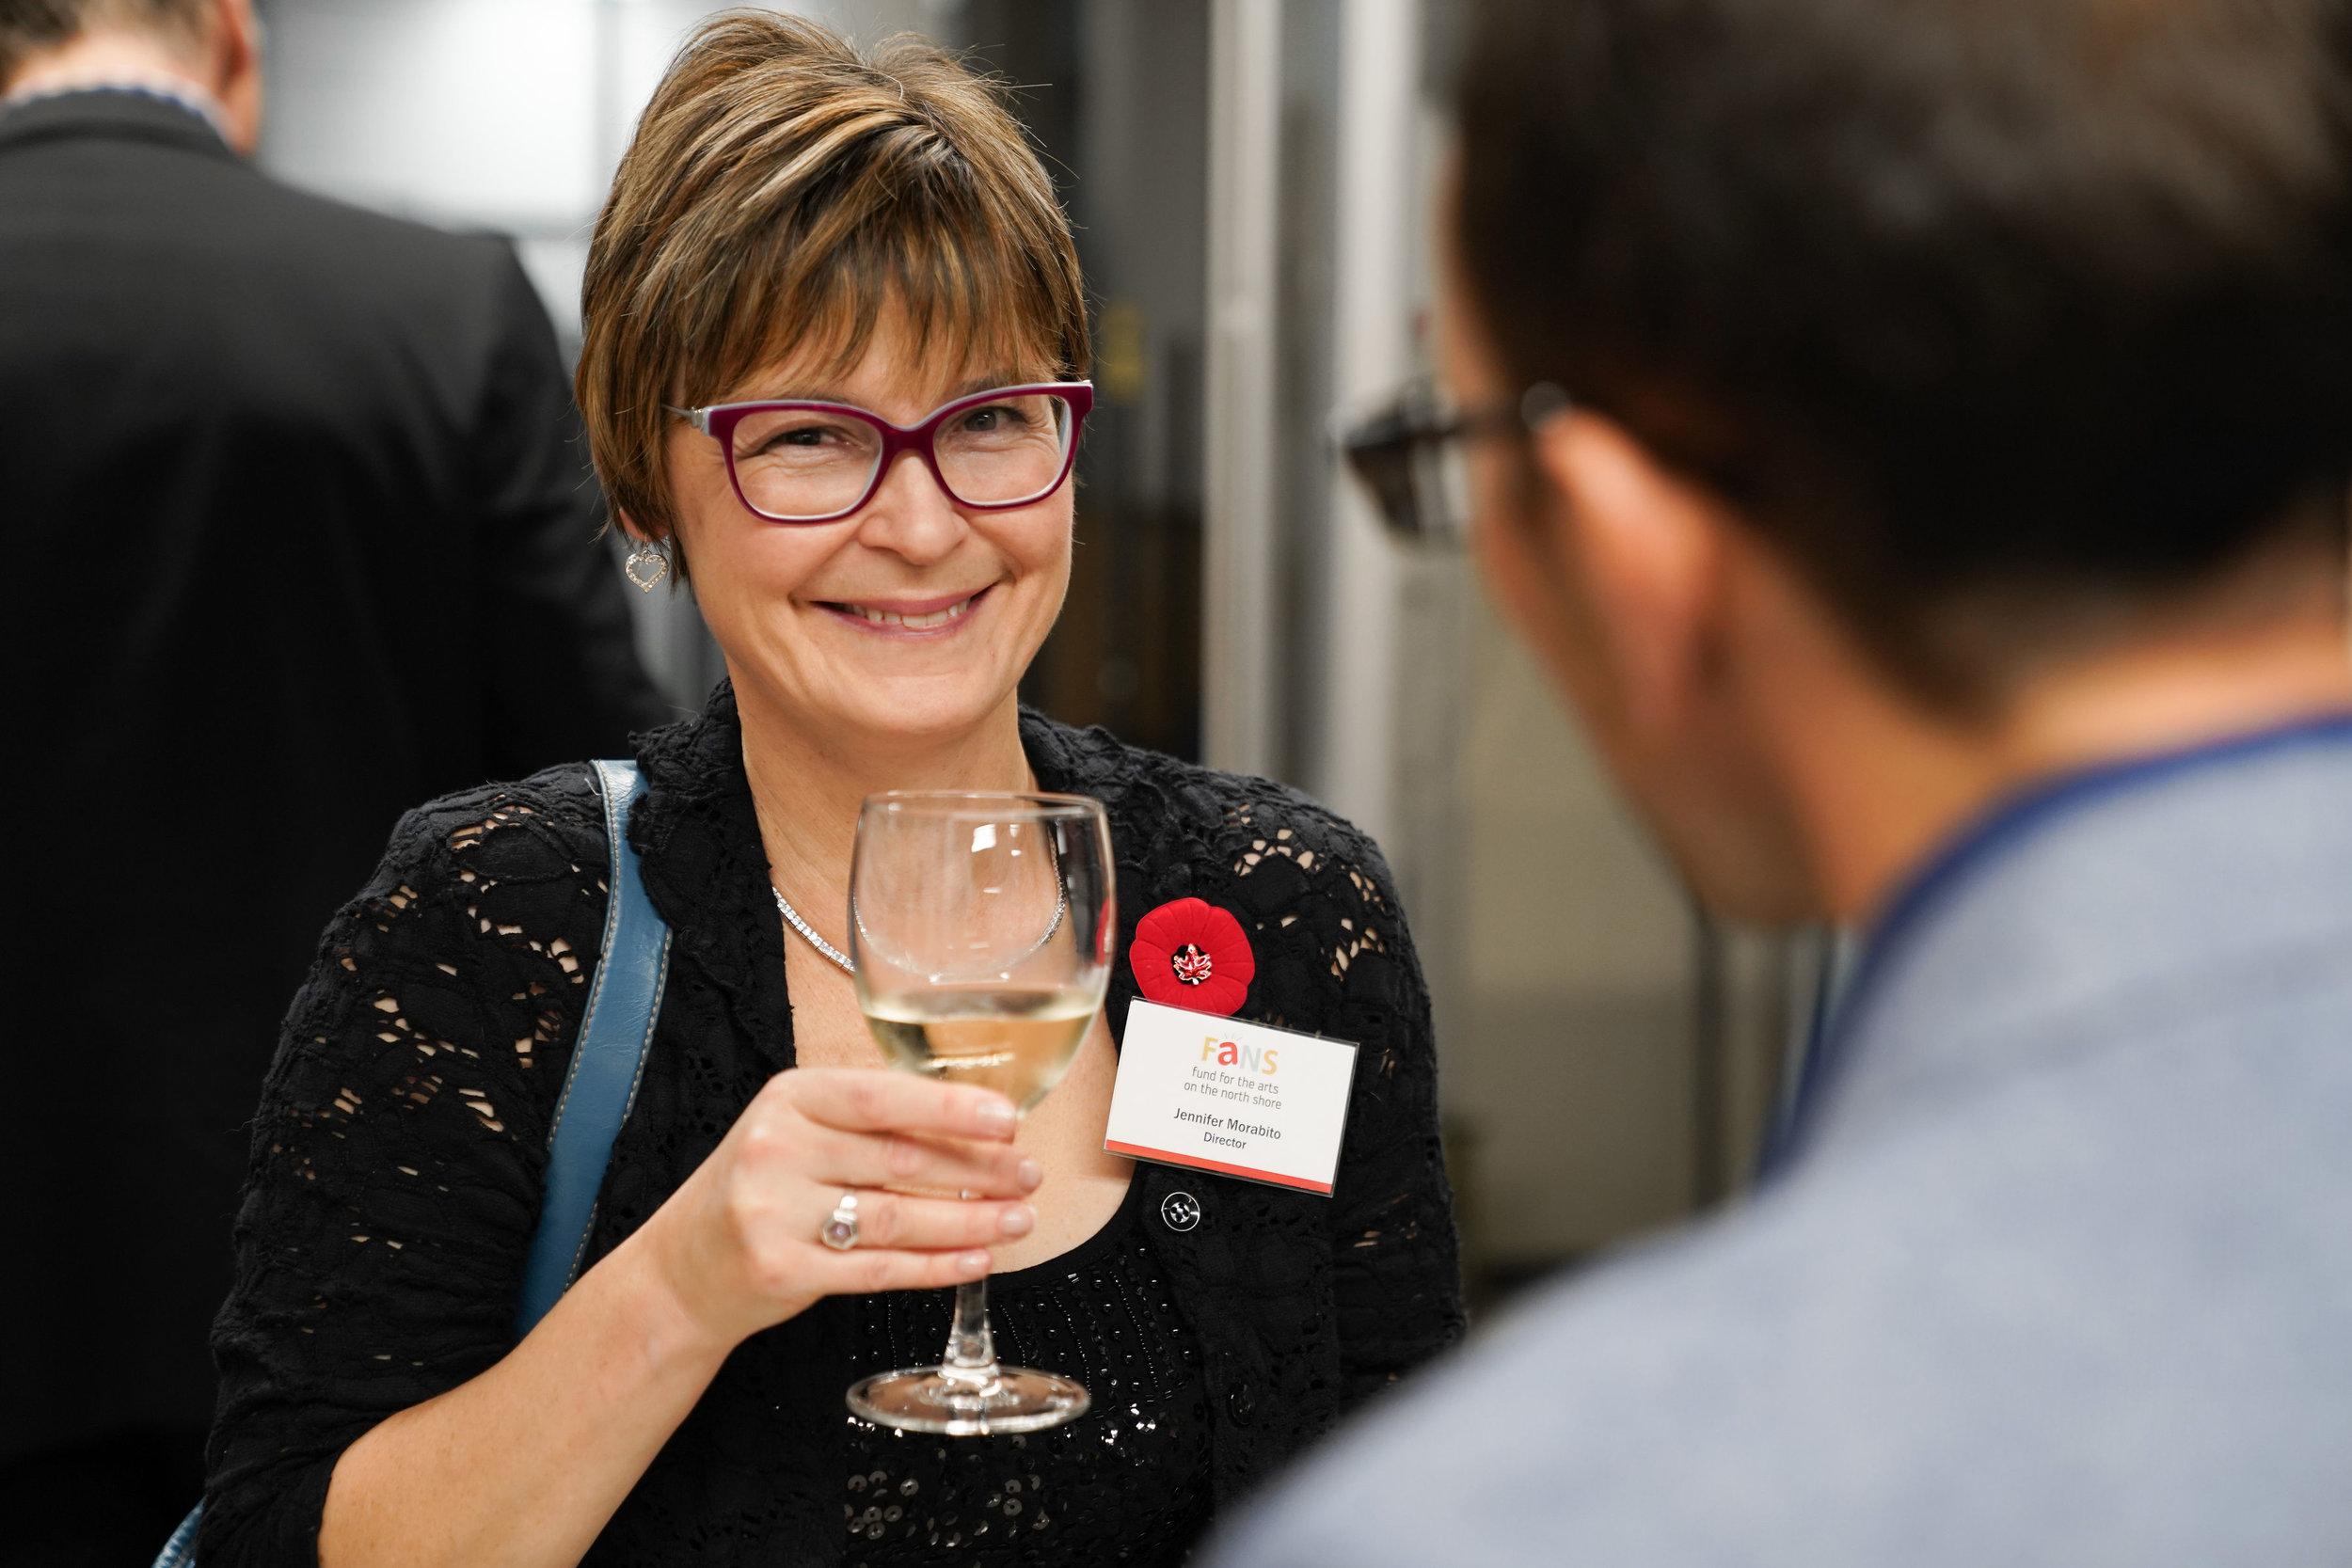 FANS Board member: Jennifer Morabito